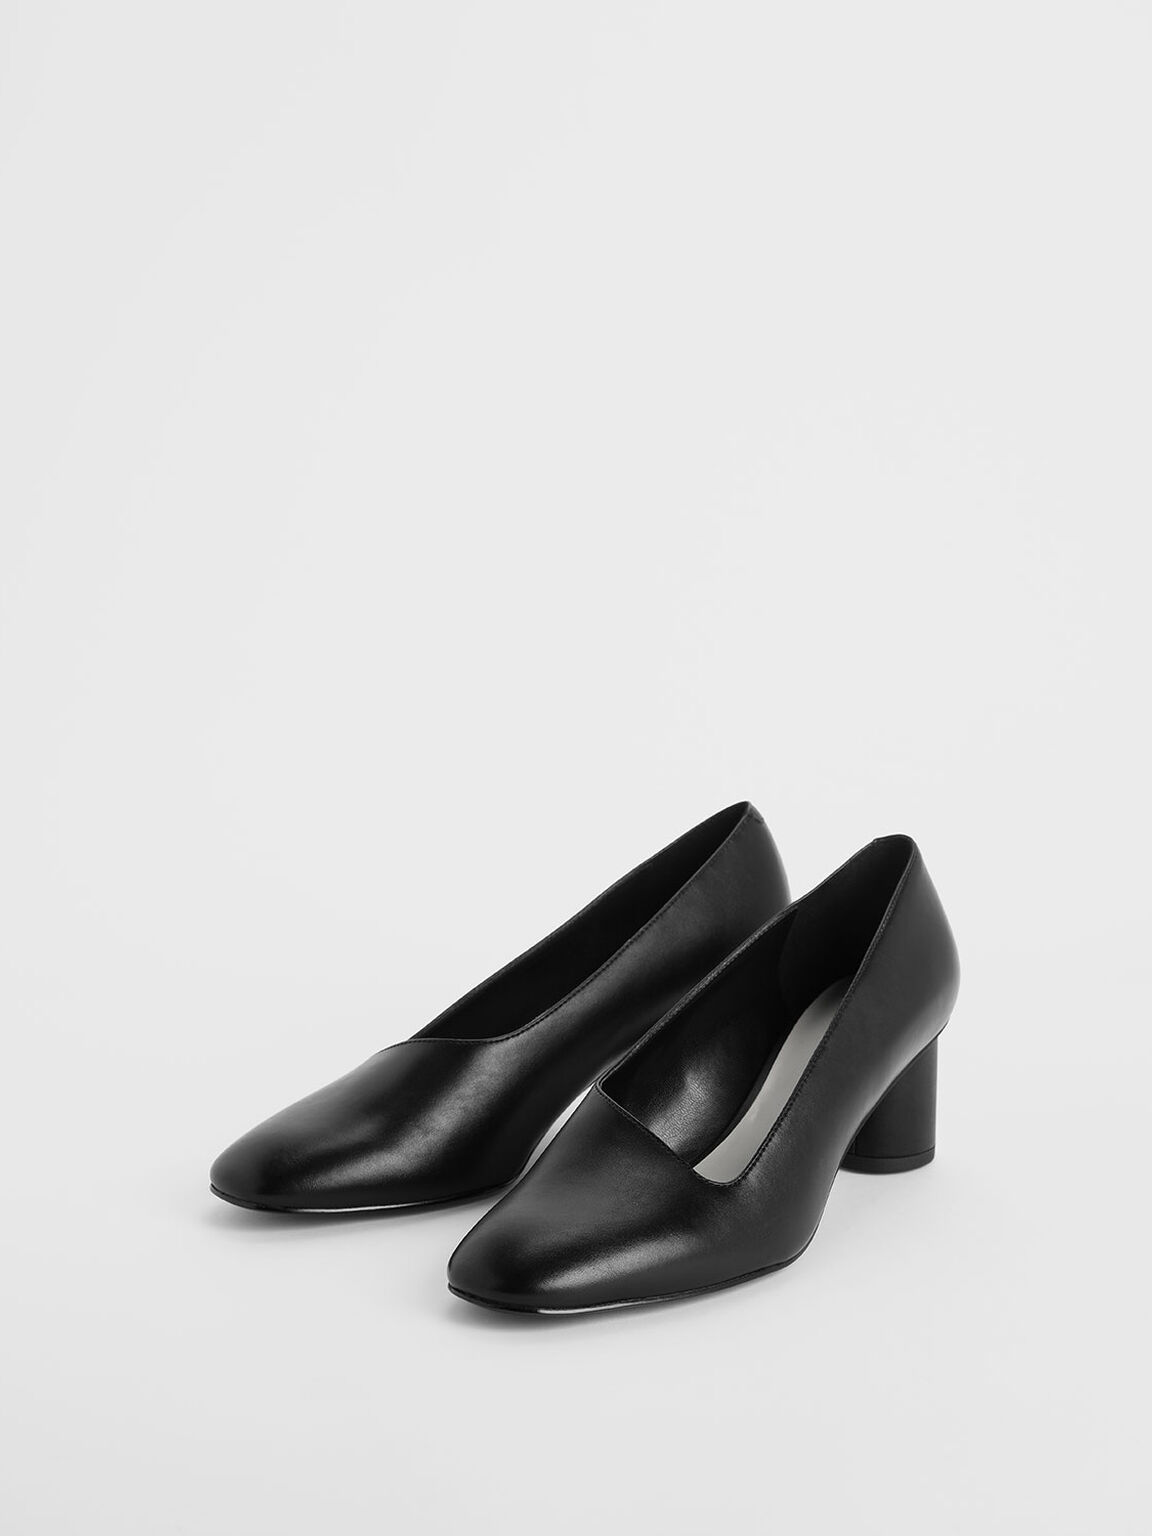 Asymmetric-Cut Cylindrical Heel Pumps, Black, hi-res